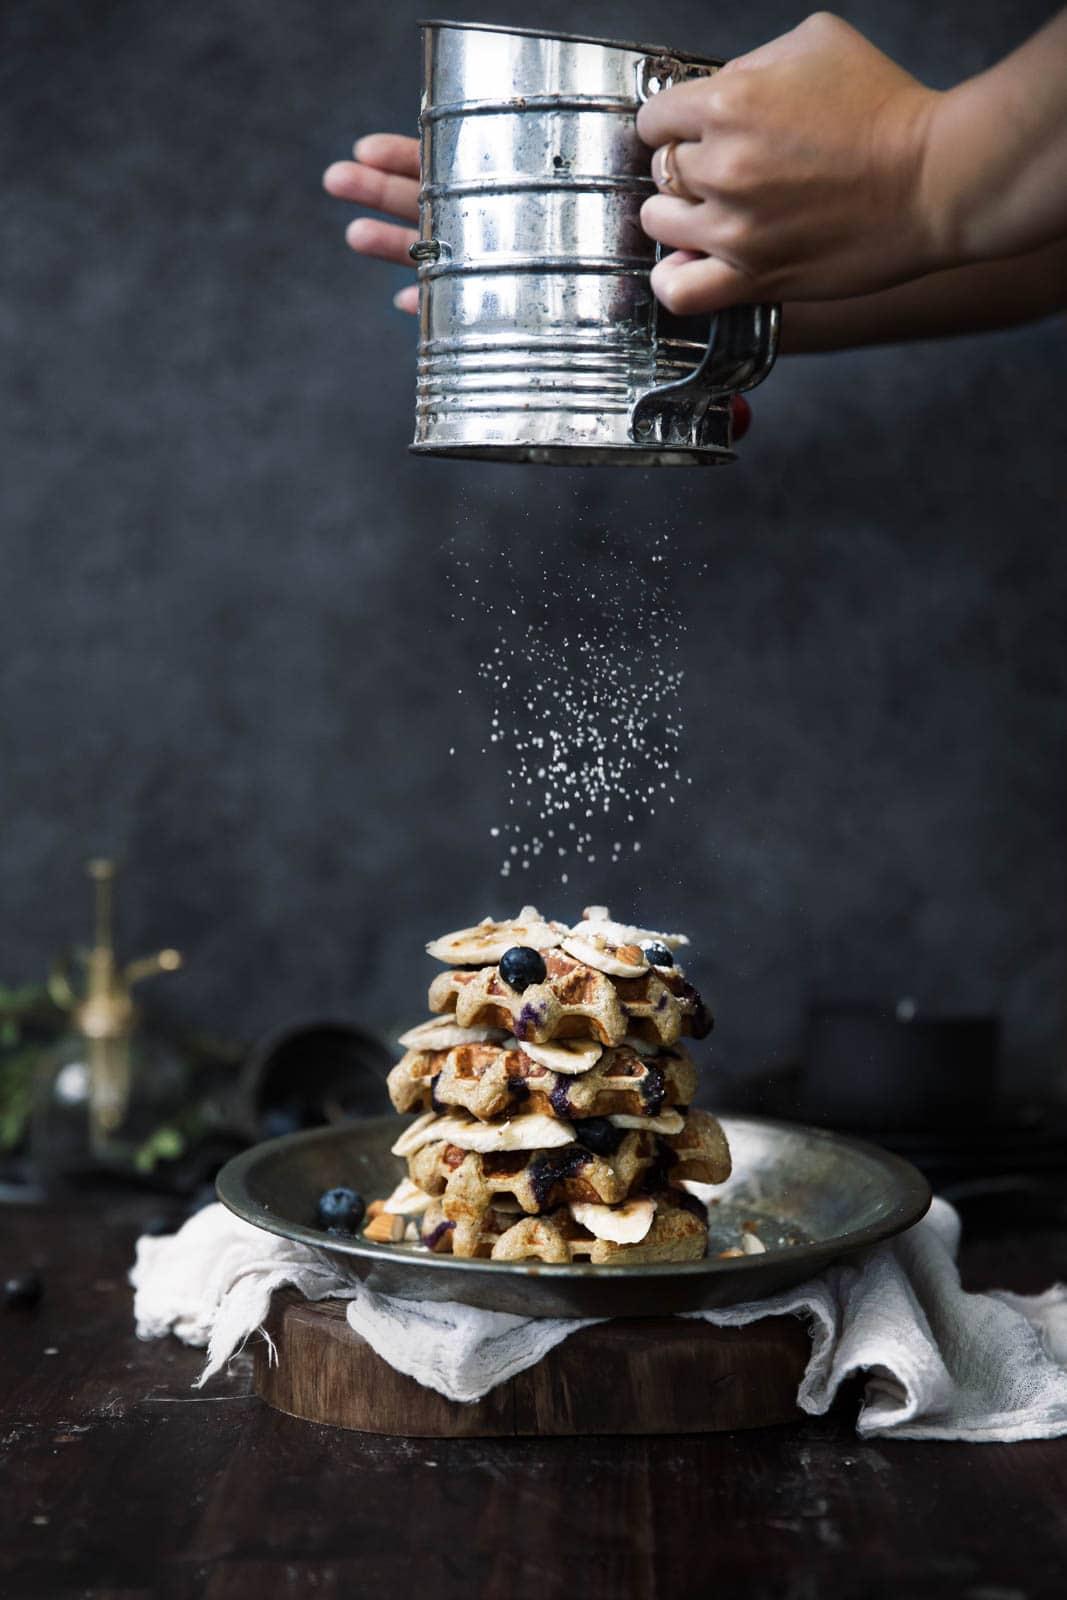 sprinkling powdered sugar onto gluten free waffles